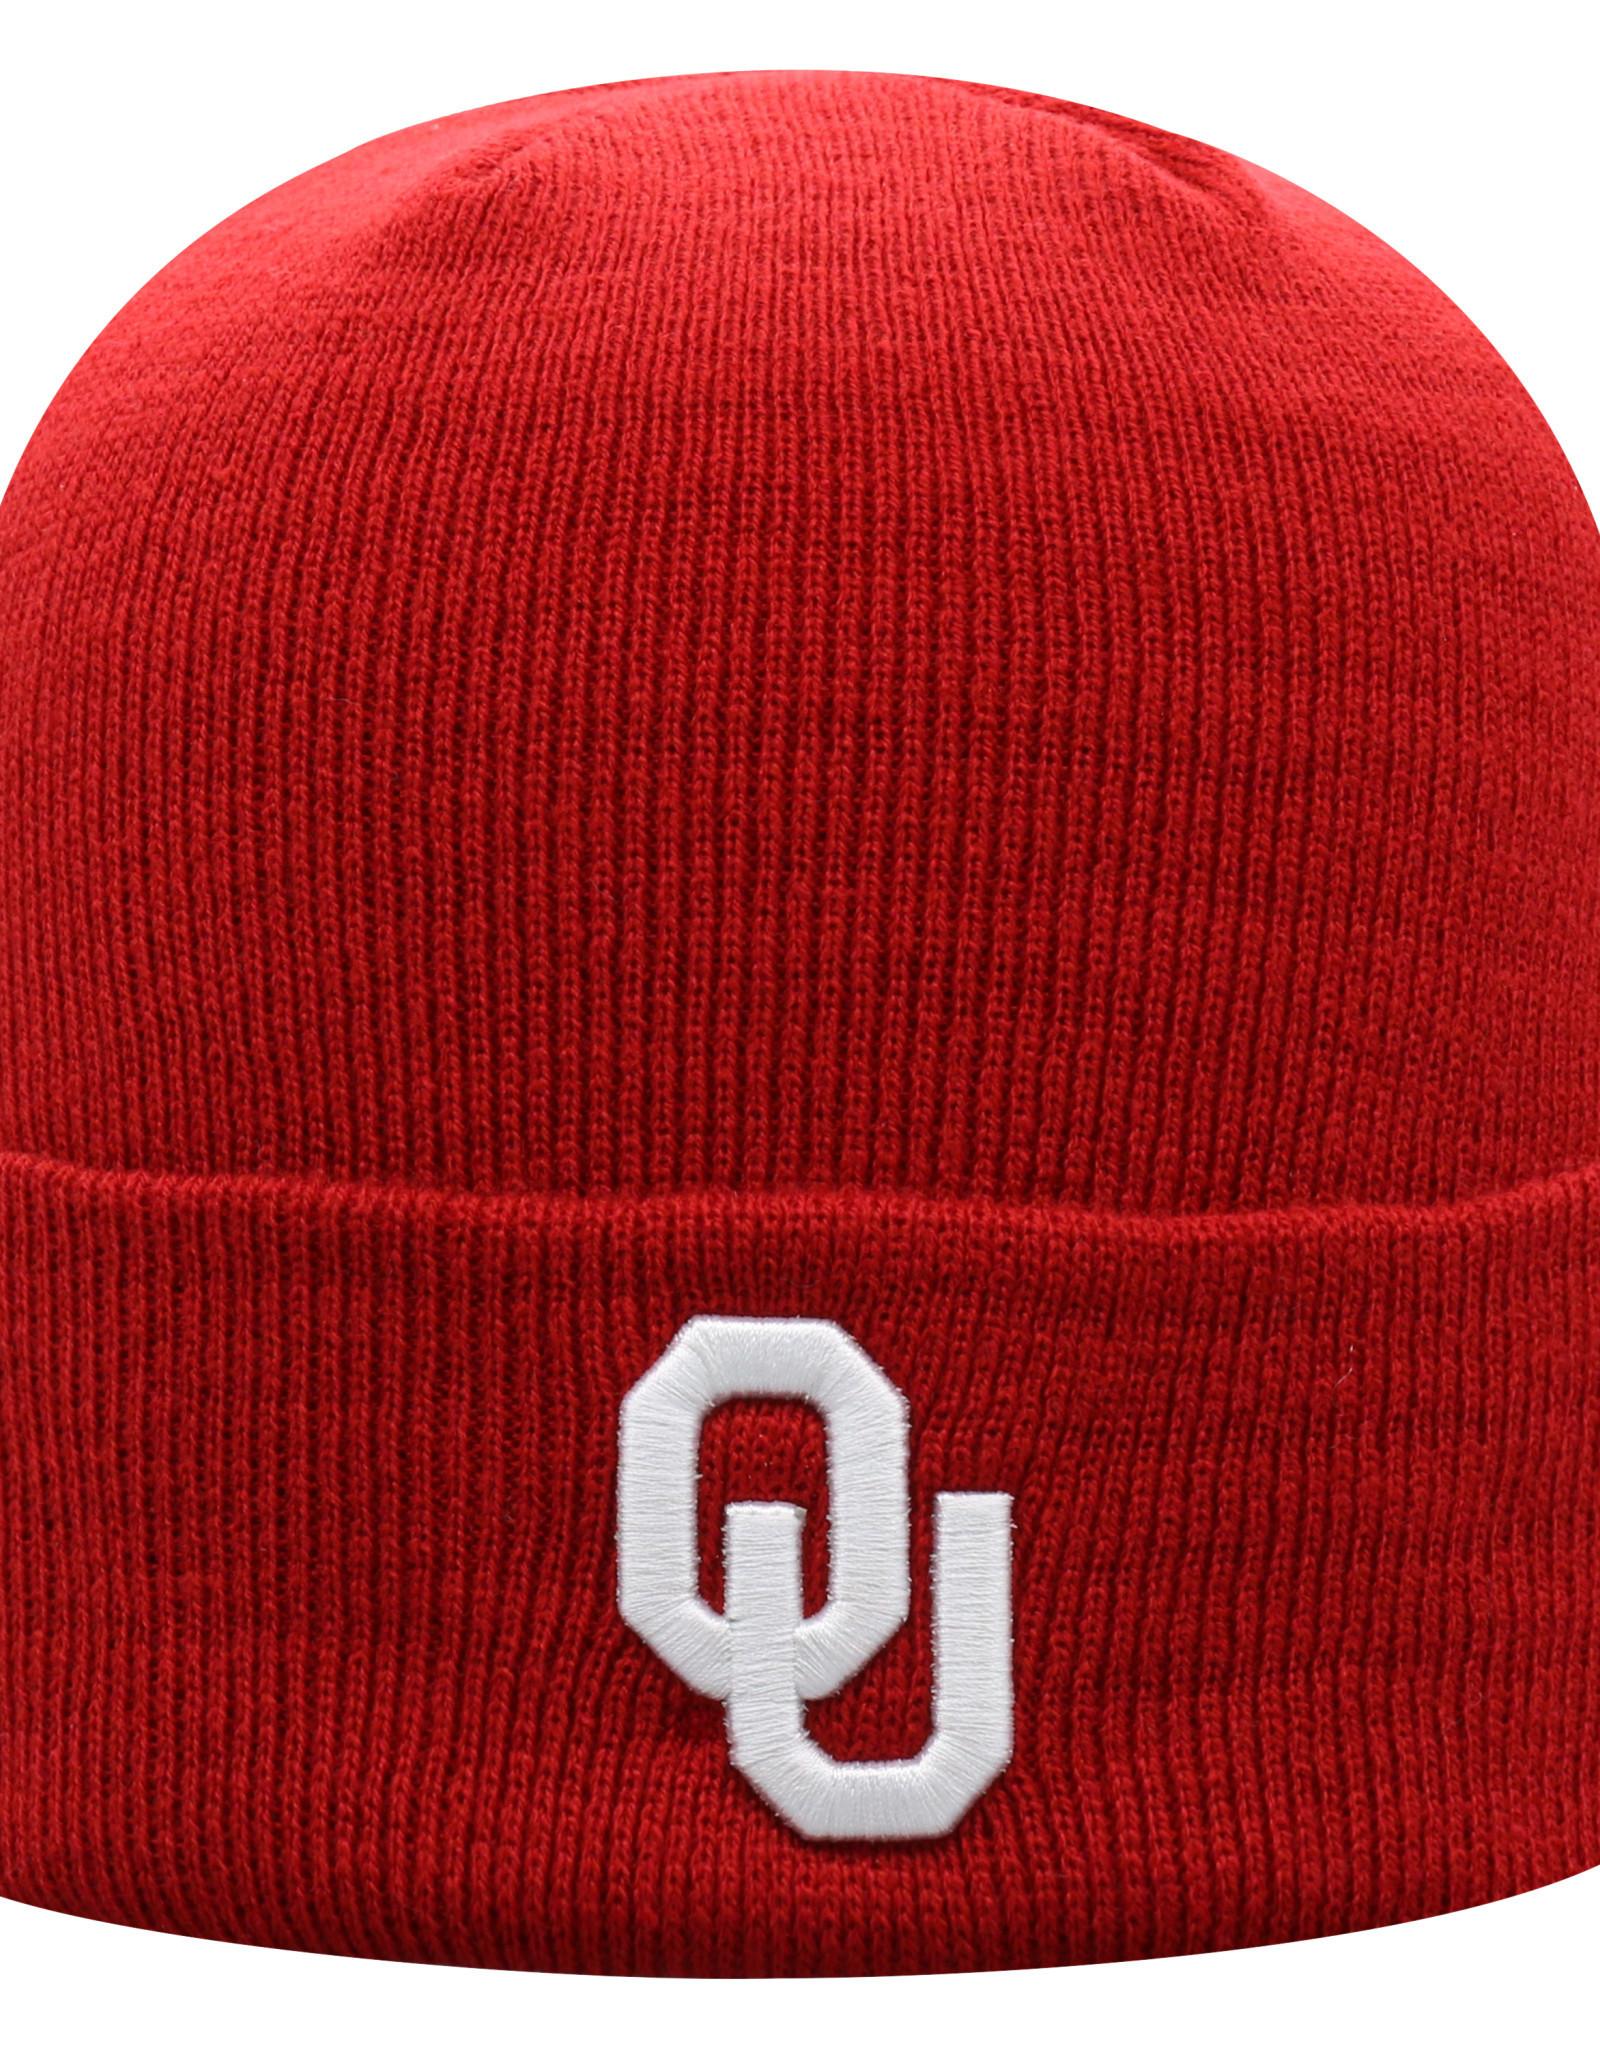 Top of the World TOW OU Schooner Crimson Cuff Knit Beanie